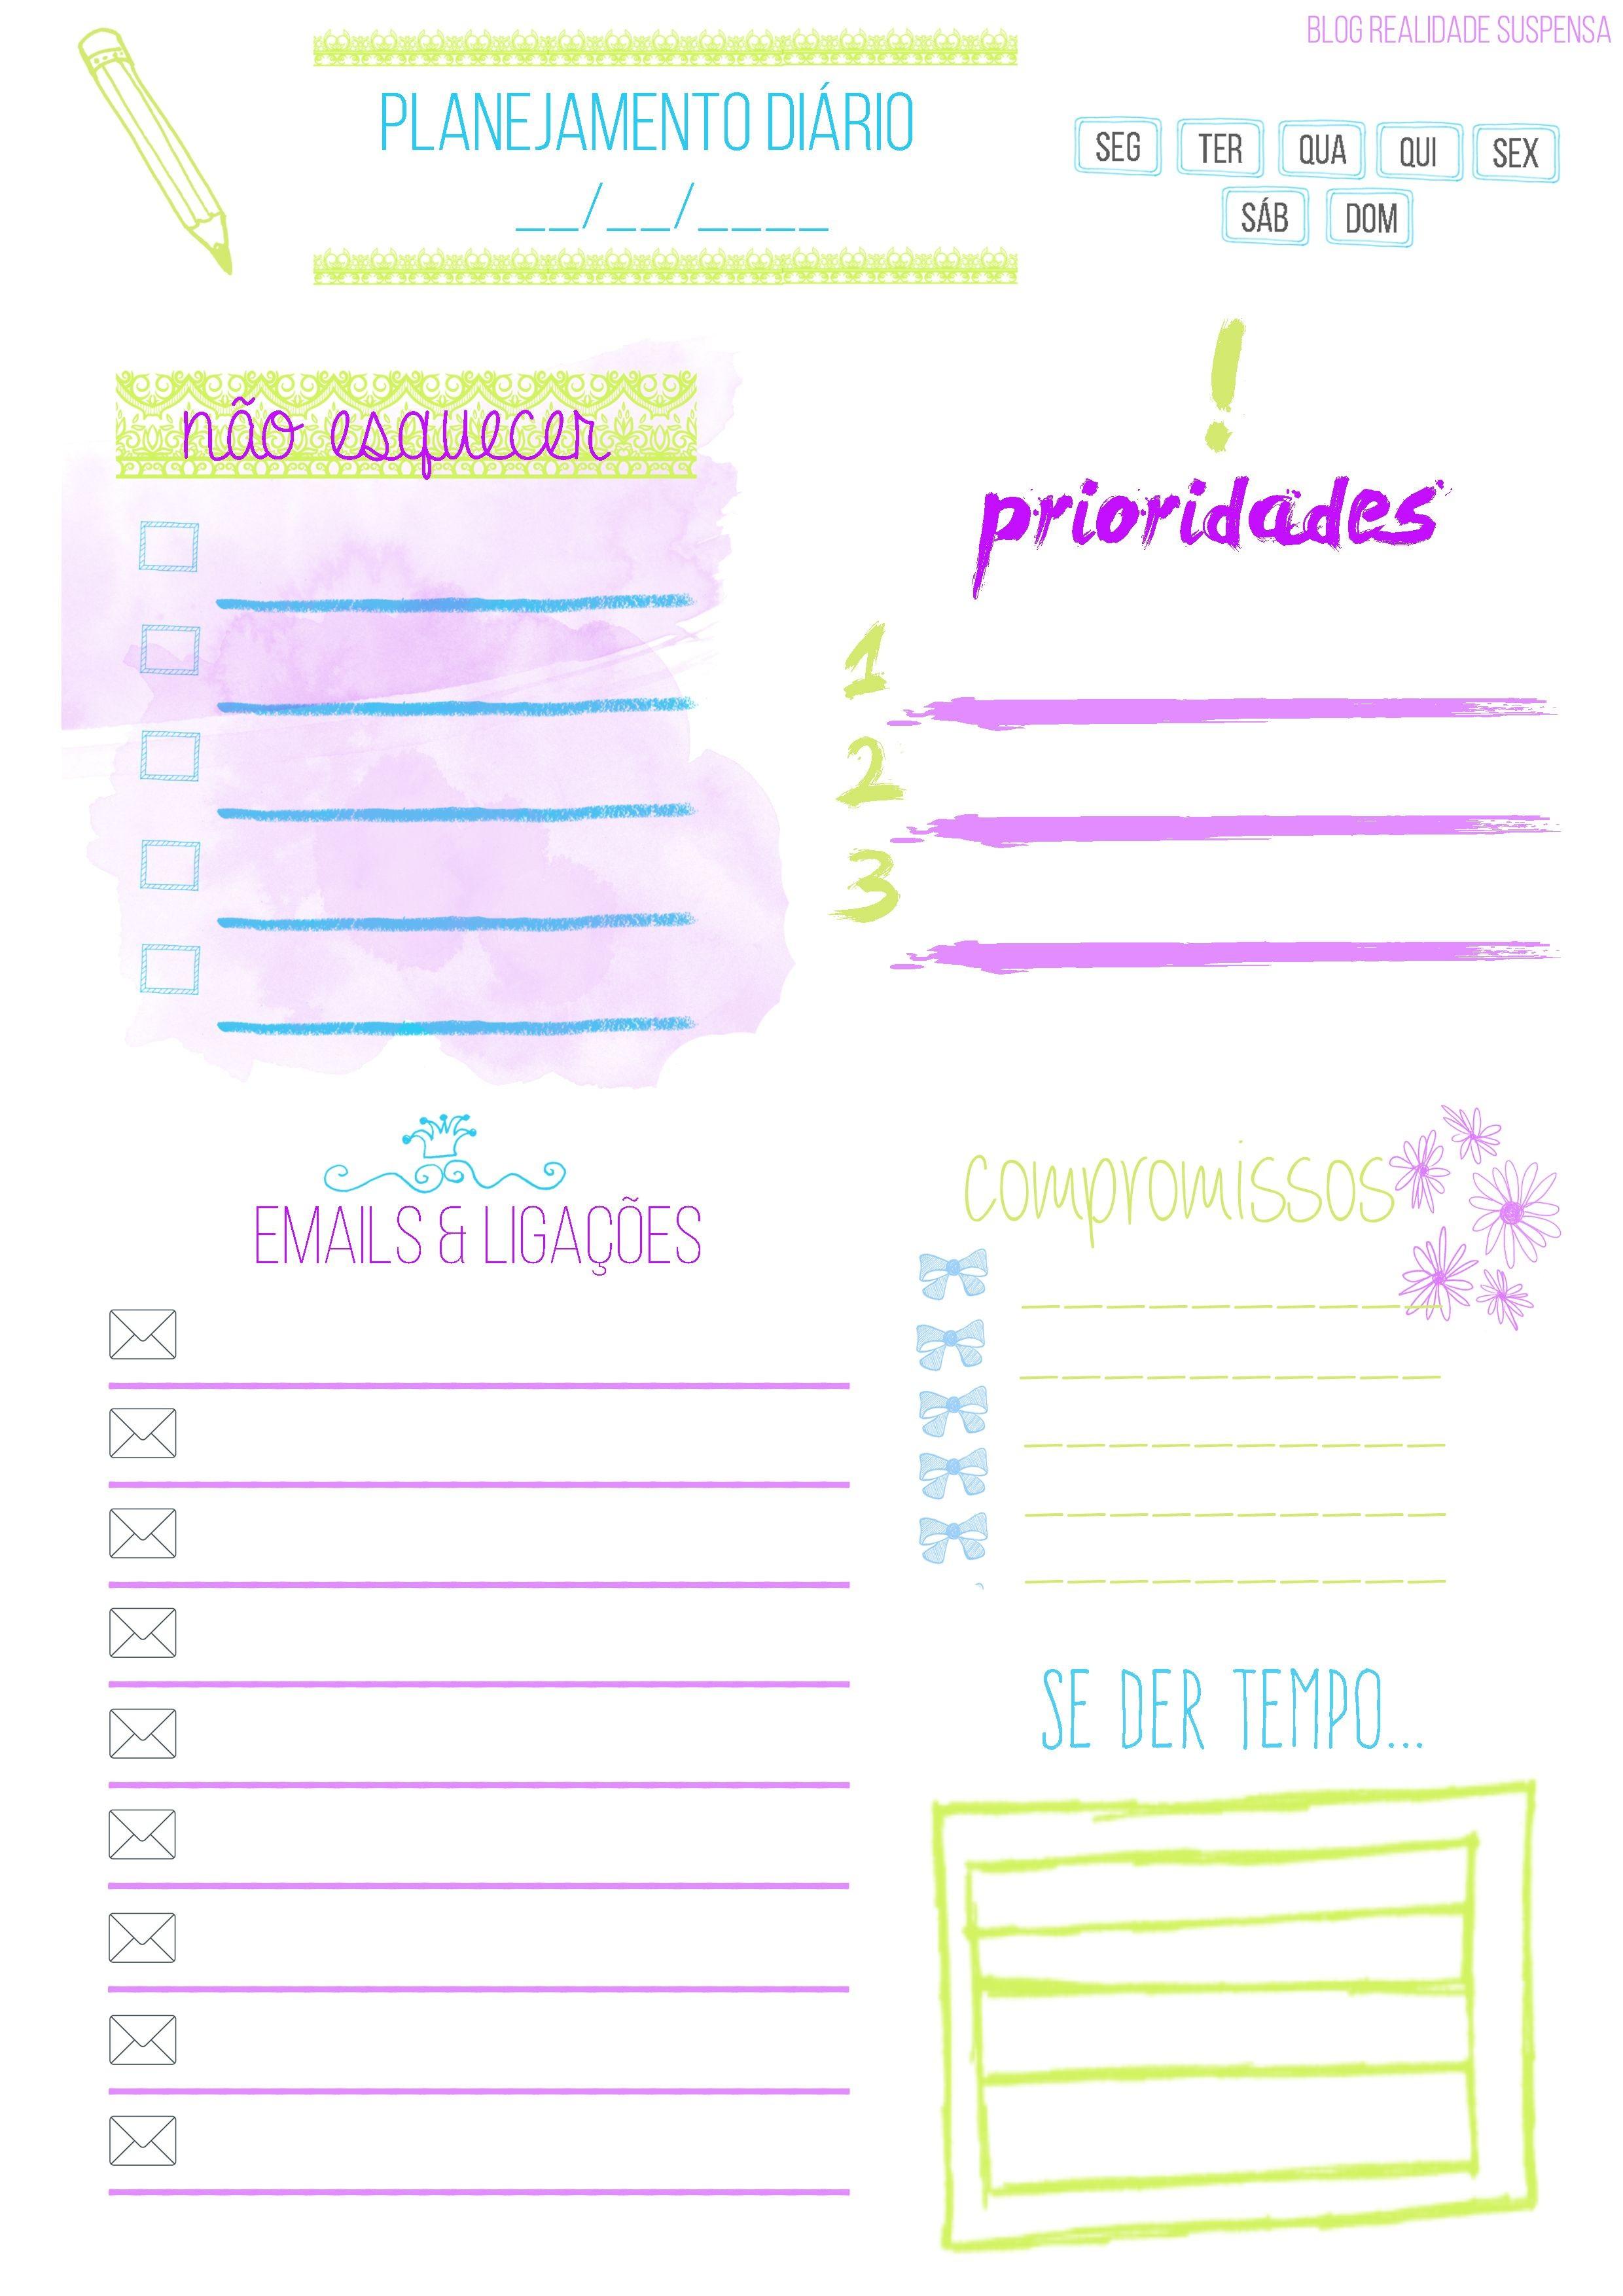 Calendario 2019 Brasil Para Imprimir Gratis Actual Janderson Gon§alves Janderson Xaxai On Pinterest